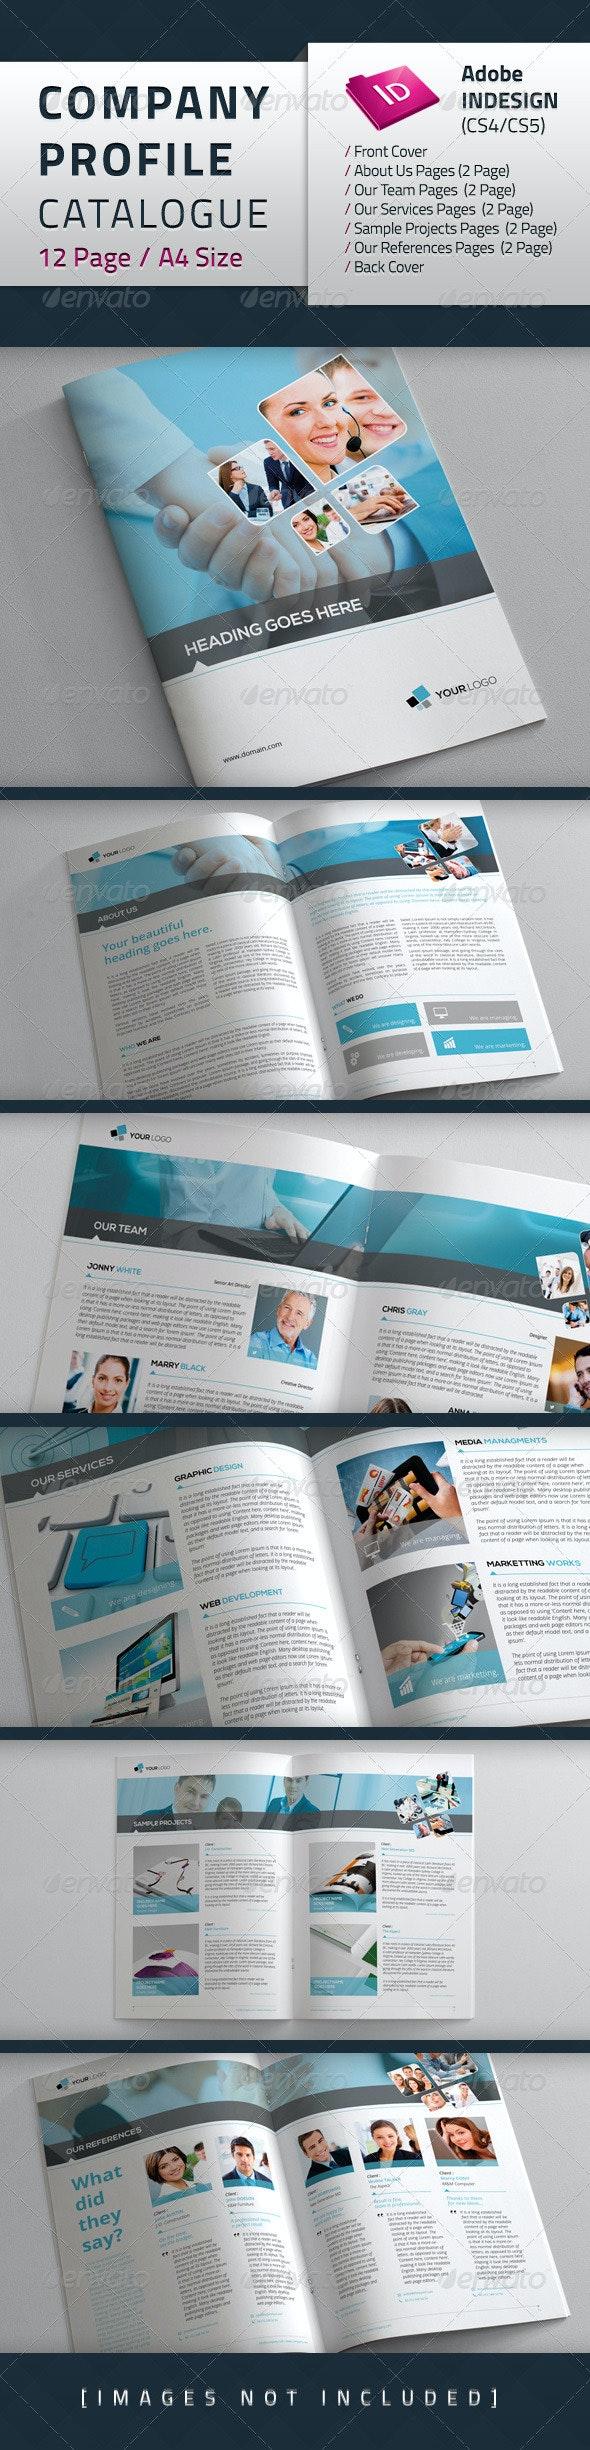 Company Profile Catalogue - Brochures Print Templates